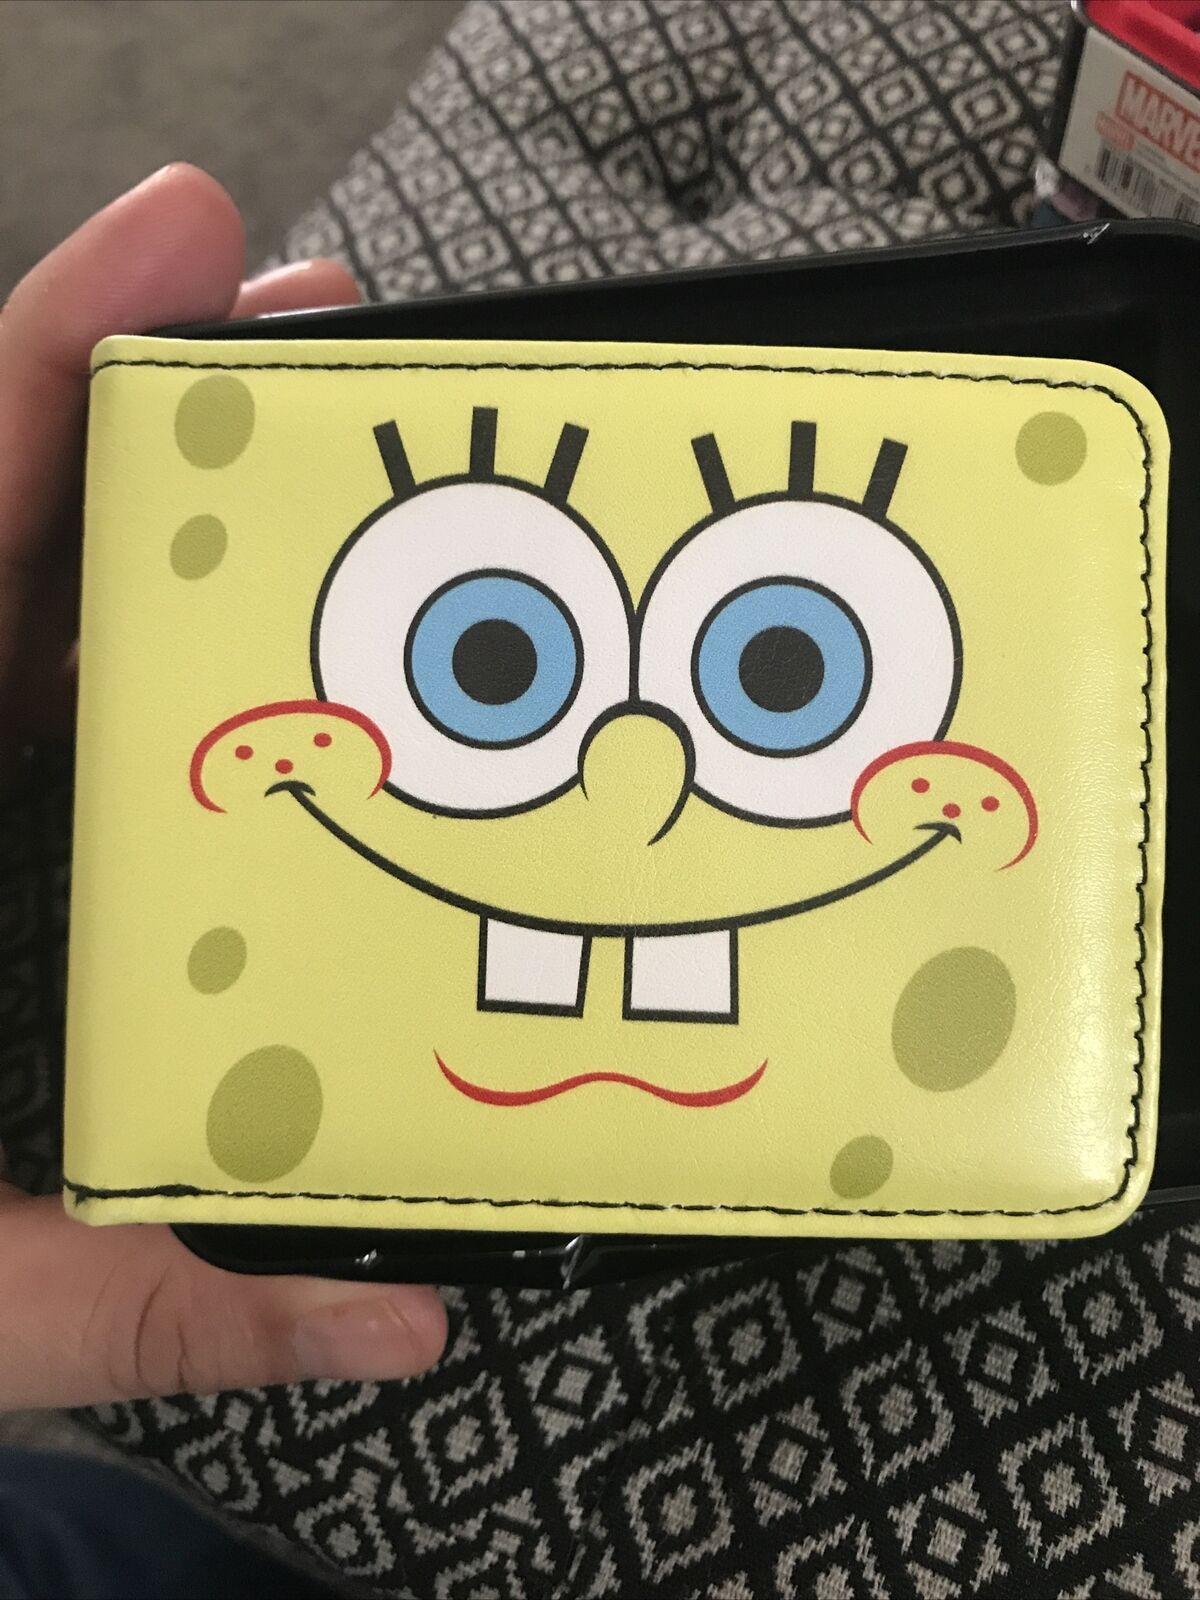 New Men's Bi-fold Wallet - Nickelodeon's Spongebob Squarepants